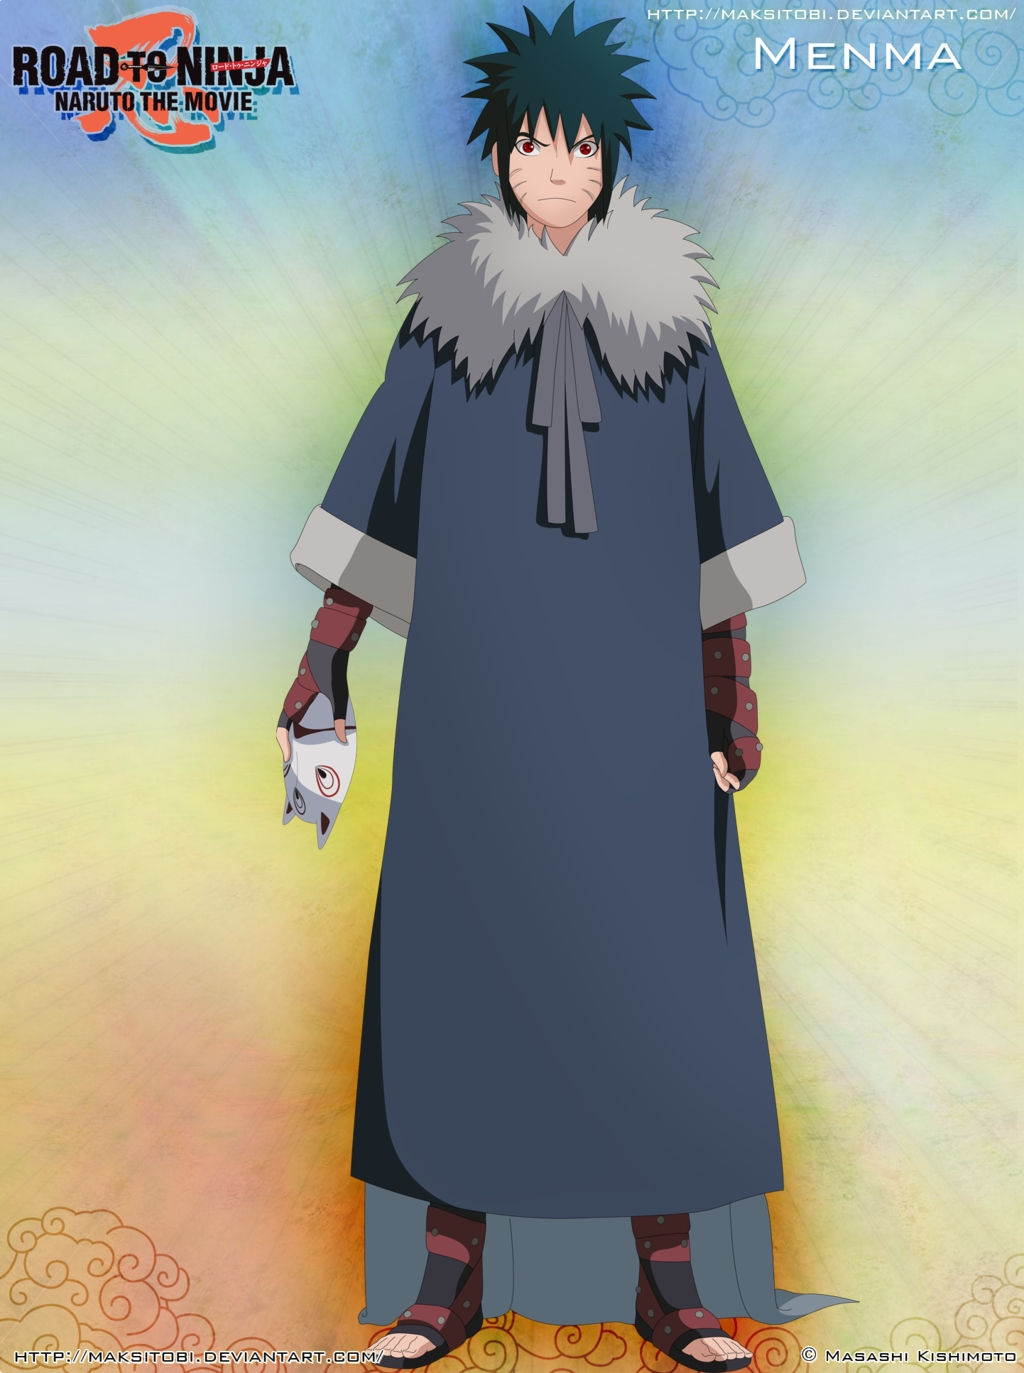 Et là, tu lis quoi ? - Page 2 Menma.(Naruto.The.Movie%3A.Road.To.Ninja).full.1211461